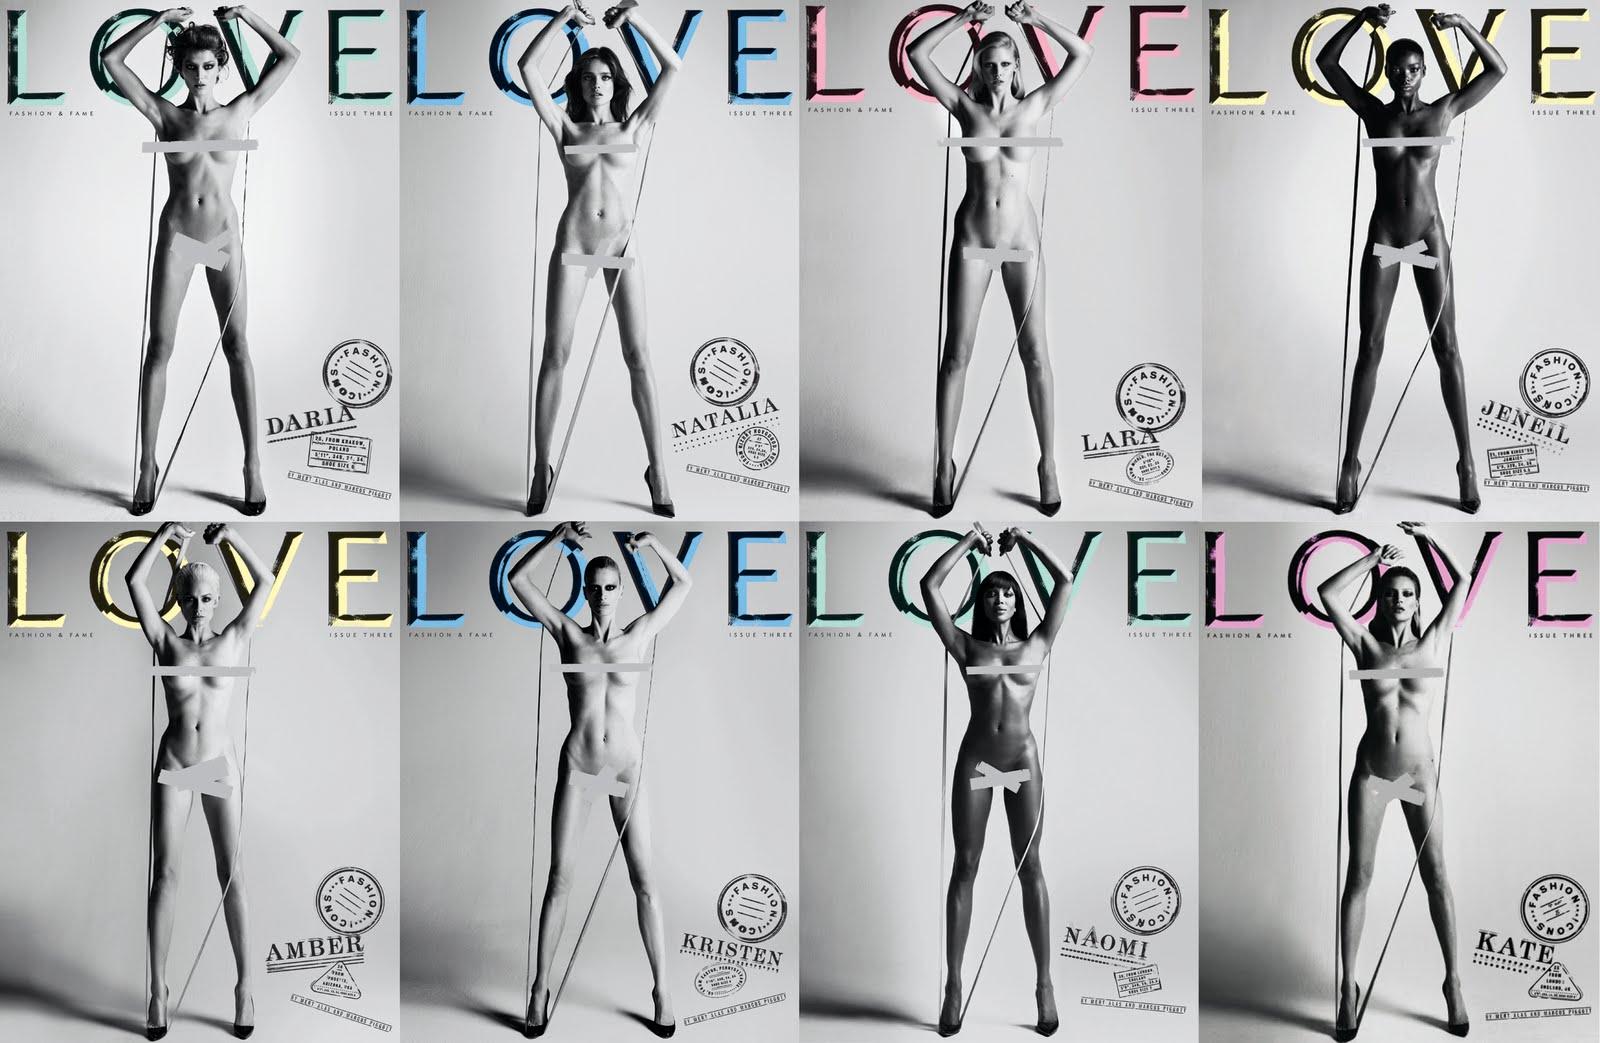 http://2.bp.blogspot.com/-Zda5X_Ku-fI/TZnMMNaWi4I/AAAAAAAAJxs/mYE4IP1l-yw/s1600/mert-fashionicons_fashionproduction_4.jpg